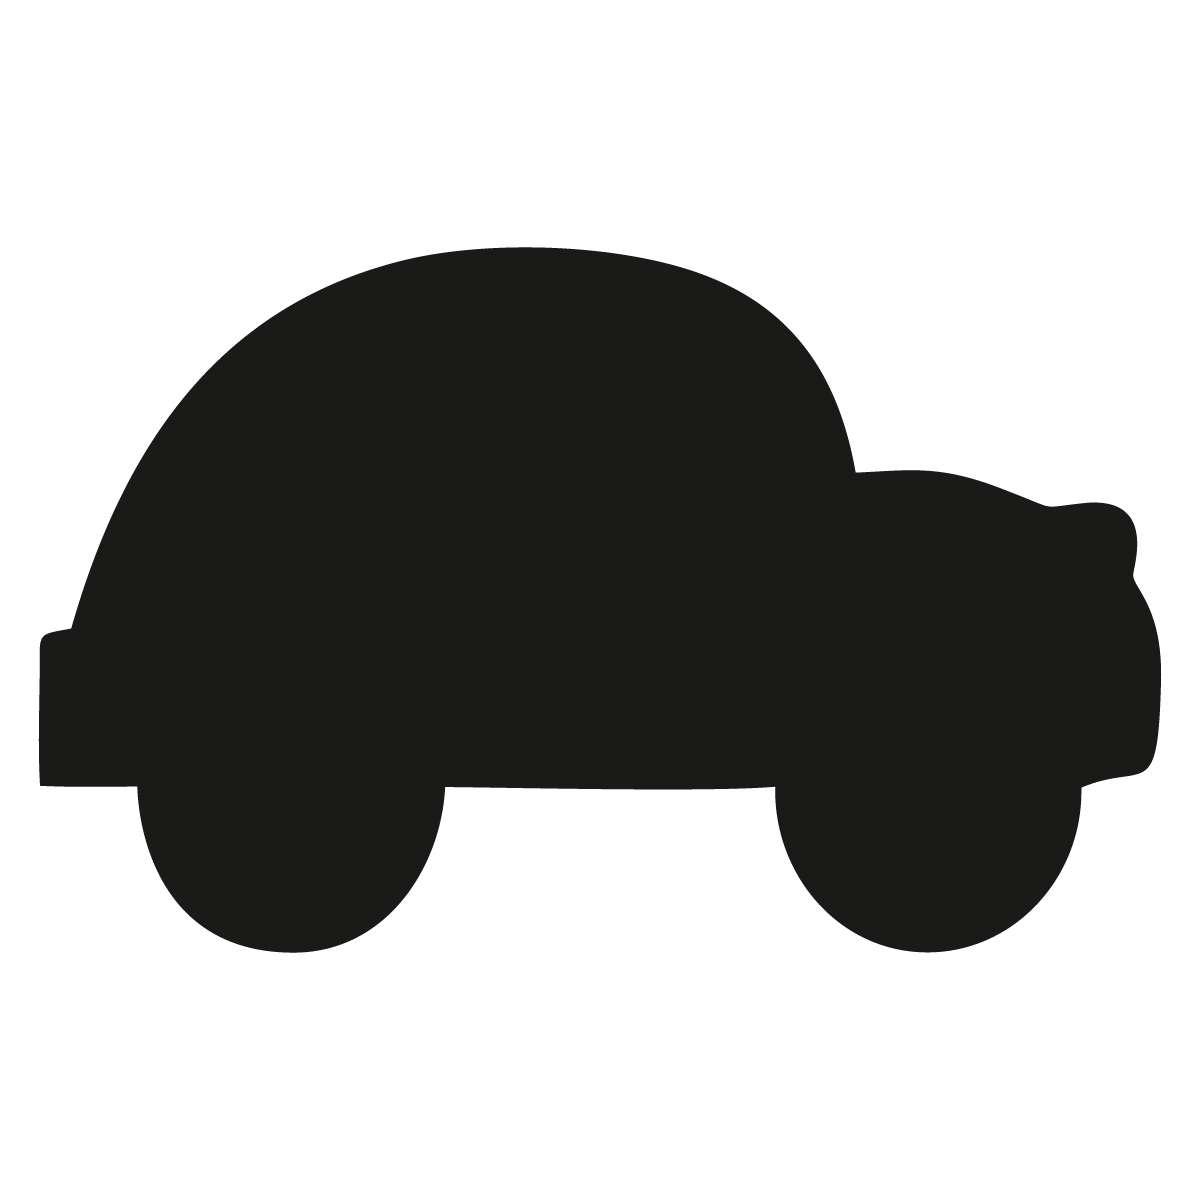 Car lipdukas - paišymo lenta